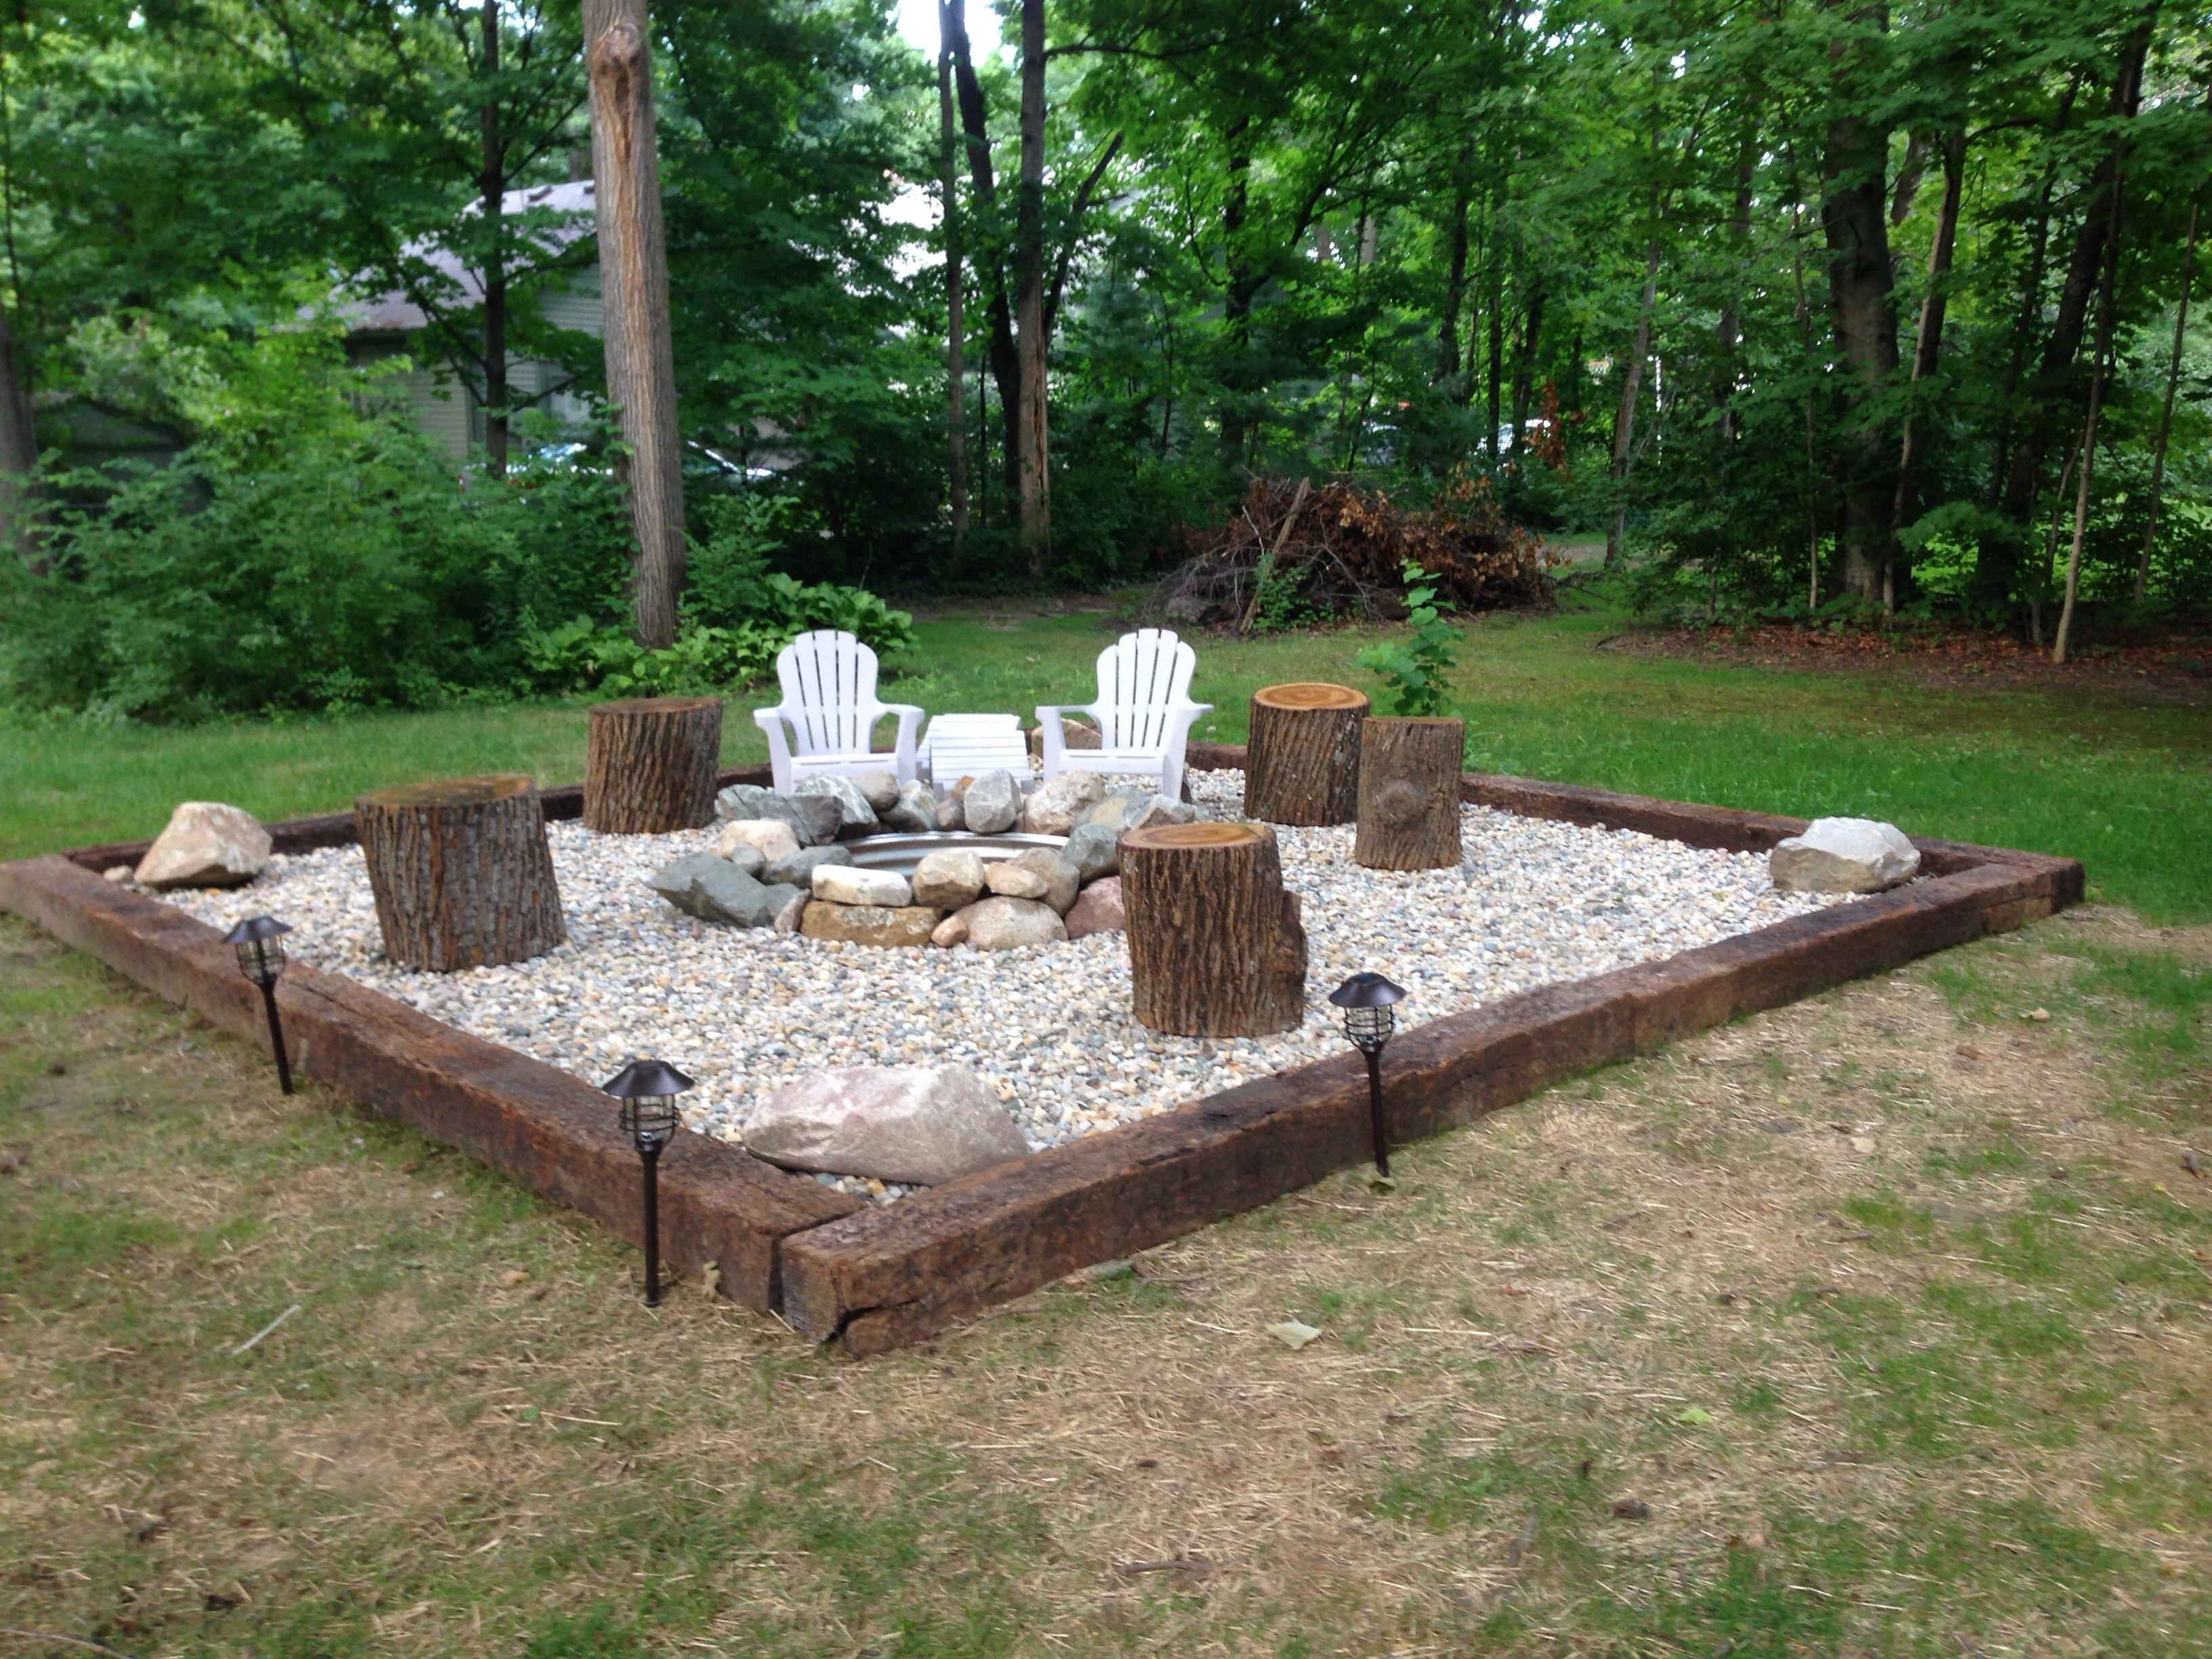 10 Beautiful Simple Backyard Fire Pit Ideas inspiration for backyard fire pit designs fire pit area fire ring 2021